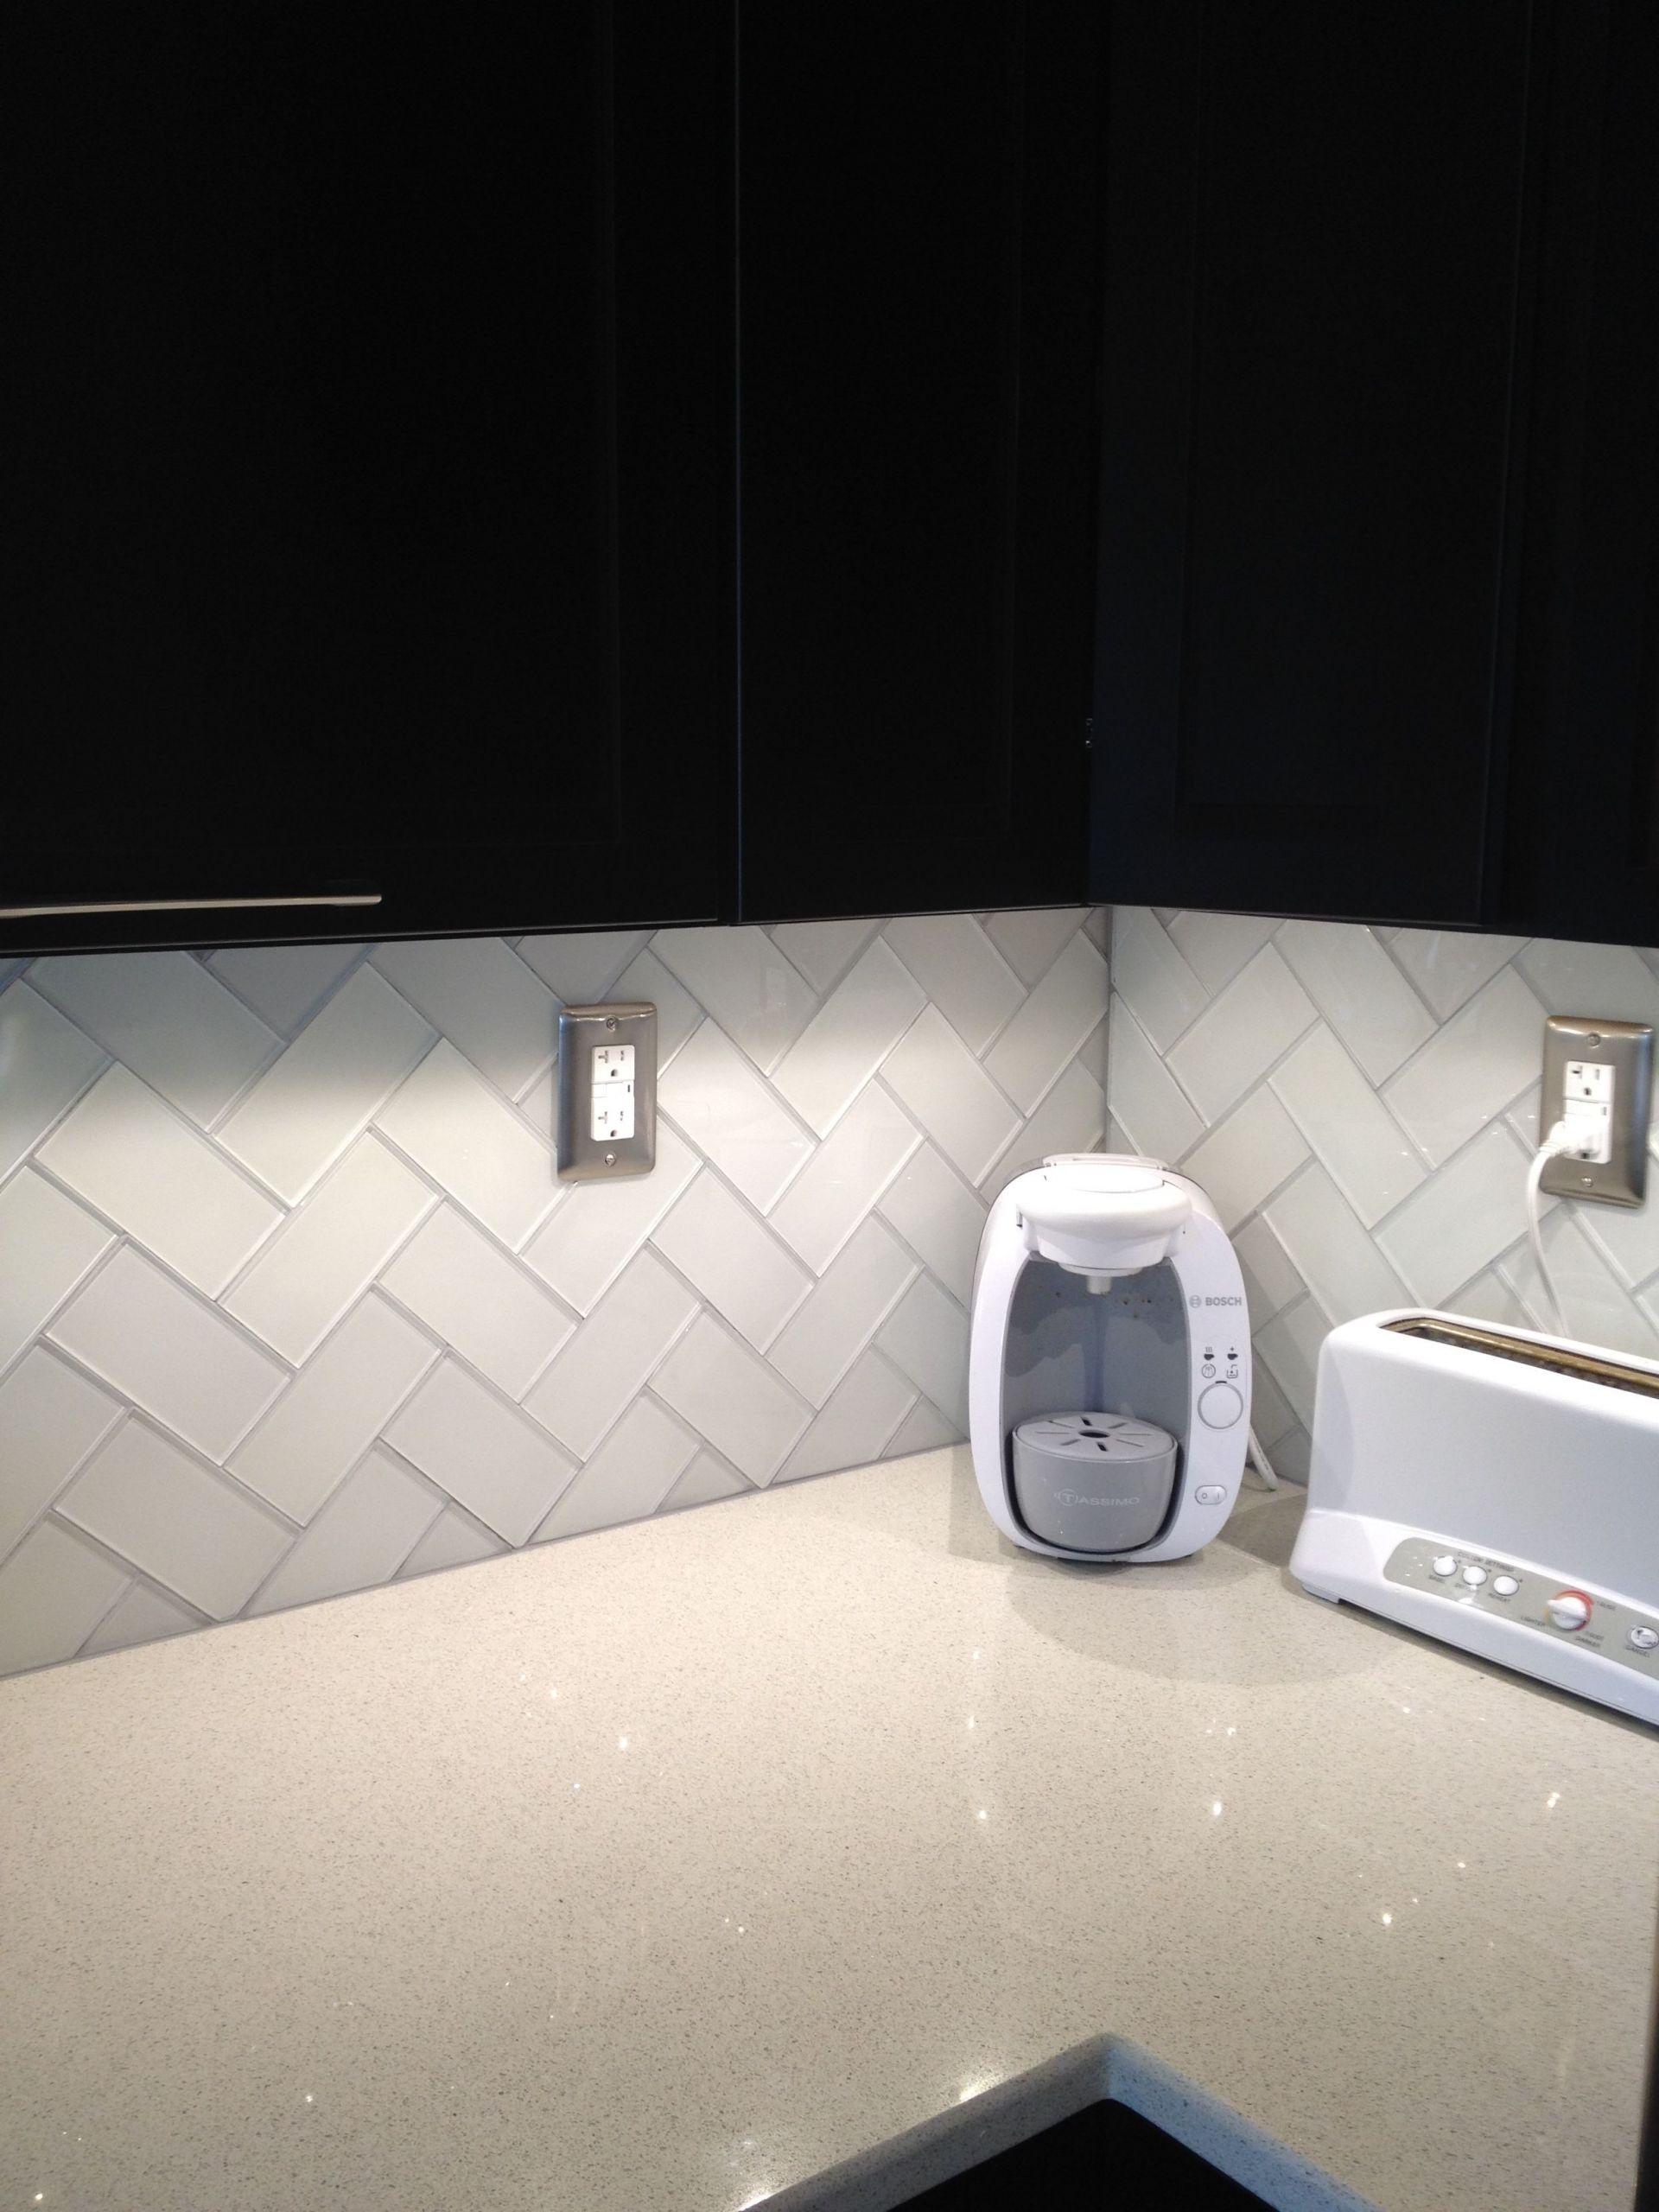 Herringbone Subway Tile New Herringbone Pattern White Glass Subway Tile Added Delorean